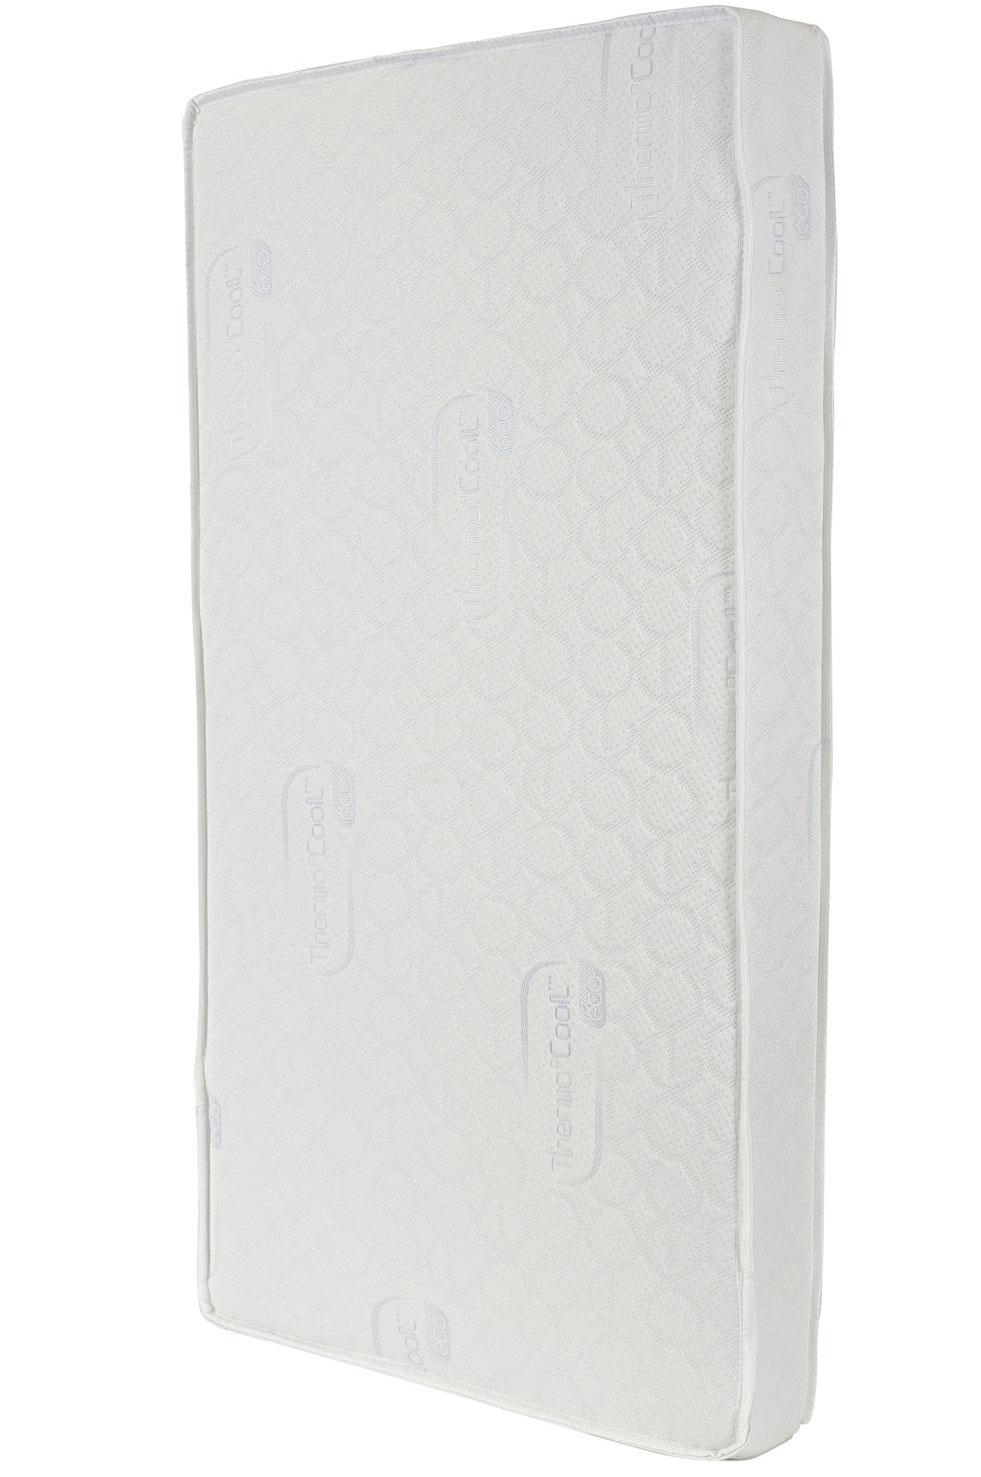 simmons crib mattresses - simmons thermocare dual sided crib mattress